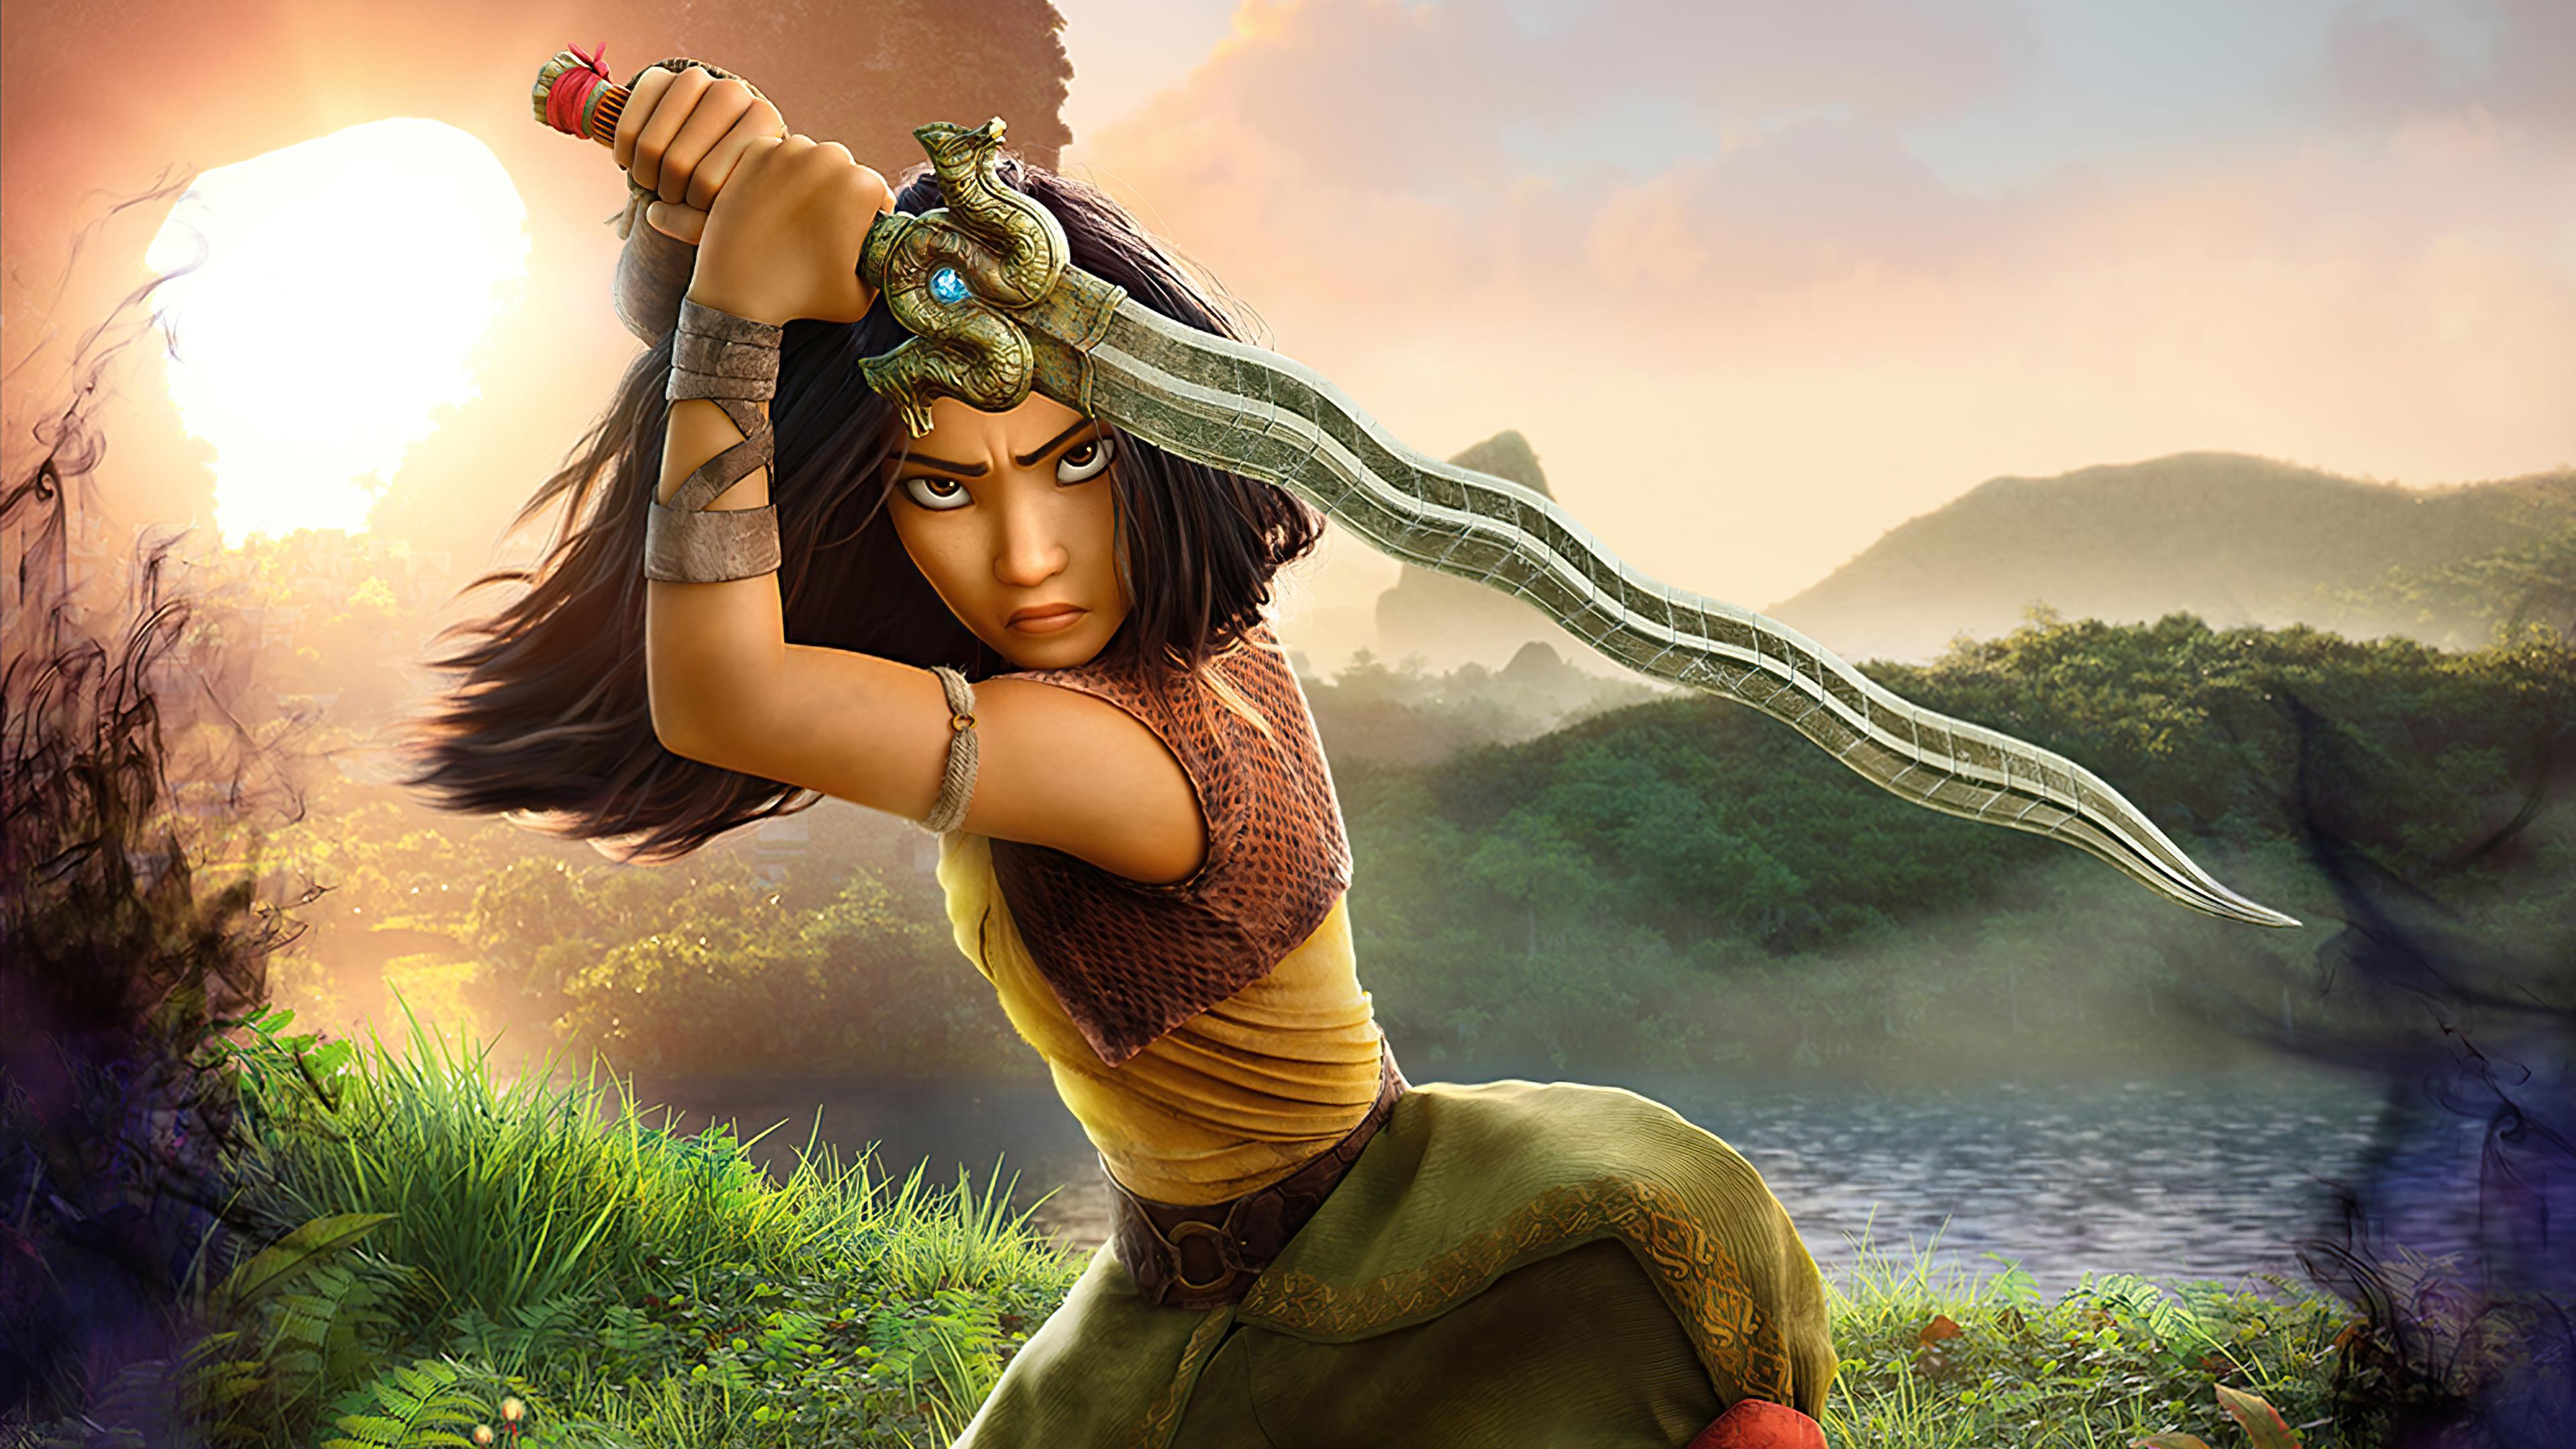 raya and the last dragon 2021 movie 4k 1617448845 - Raya And The Last Dragon 2021 Movie 4k - Raya And The Last Dragon 2021 Movie 4k wallpapers